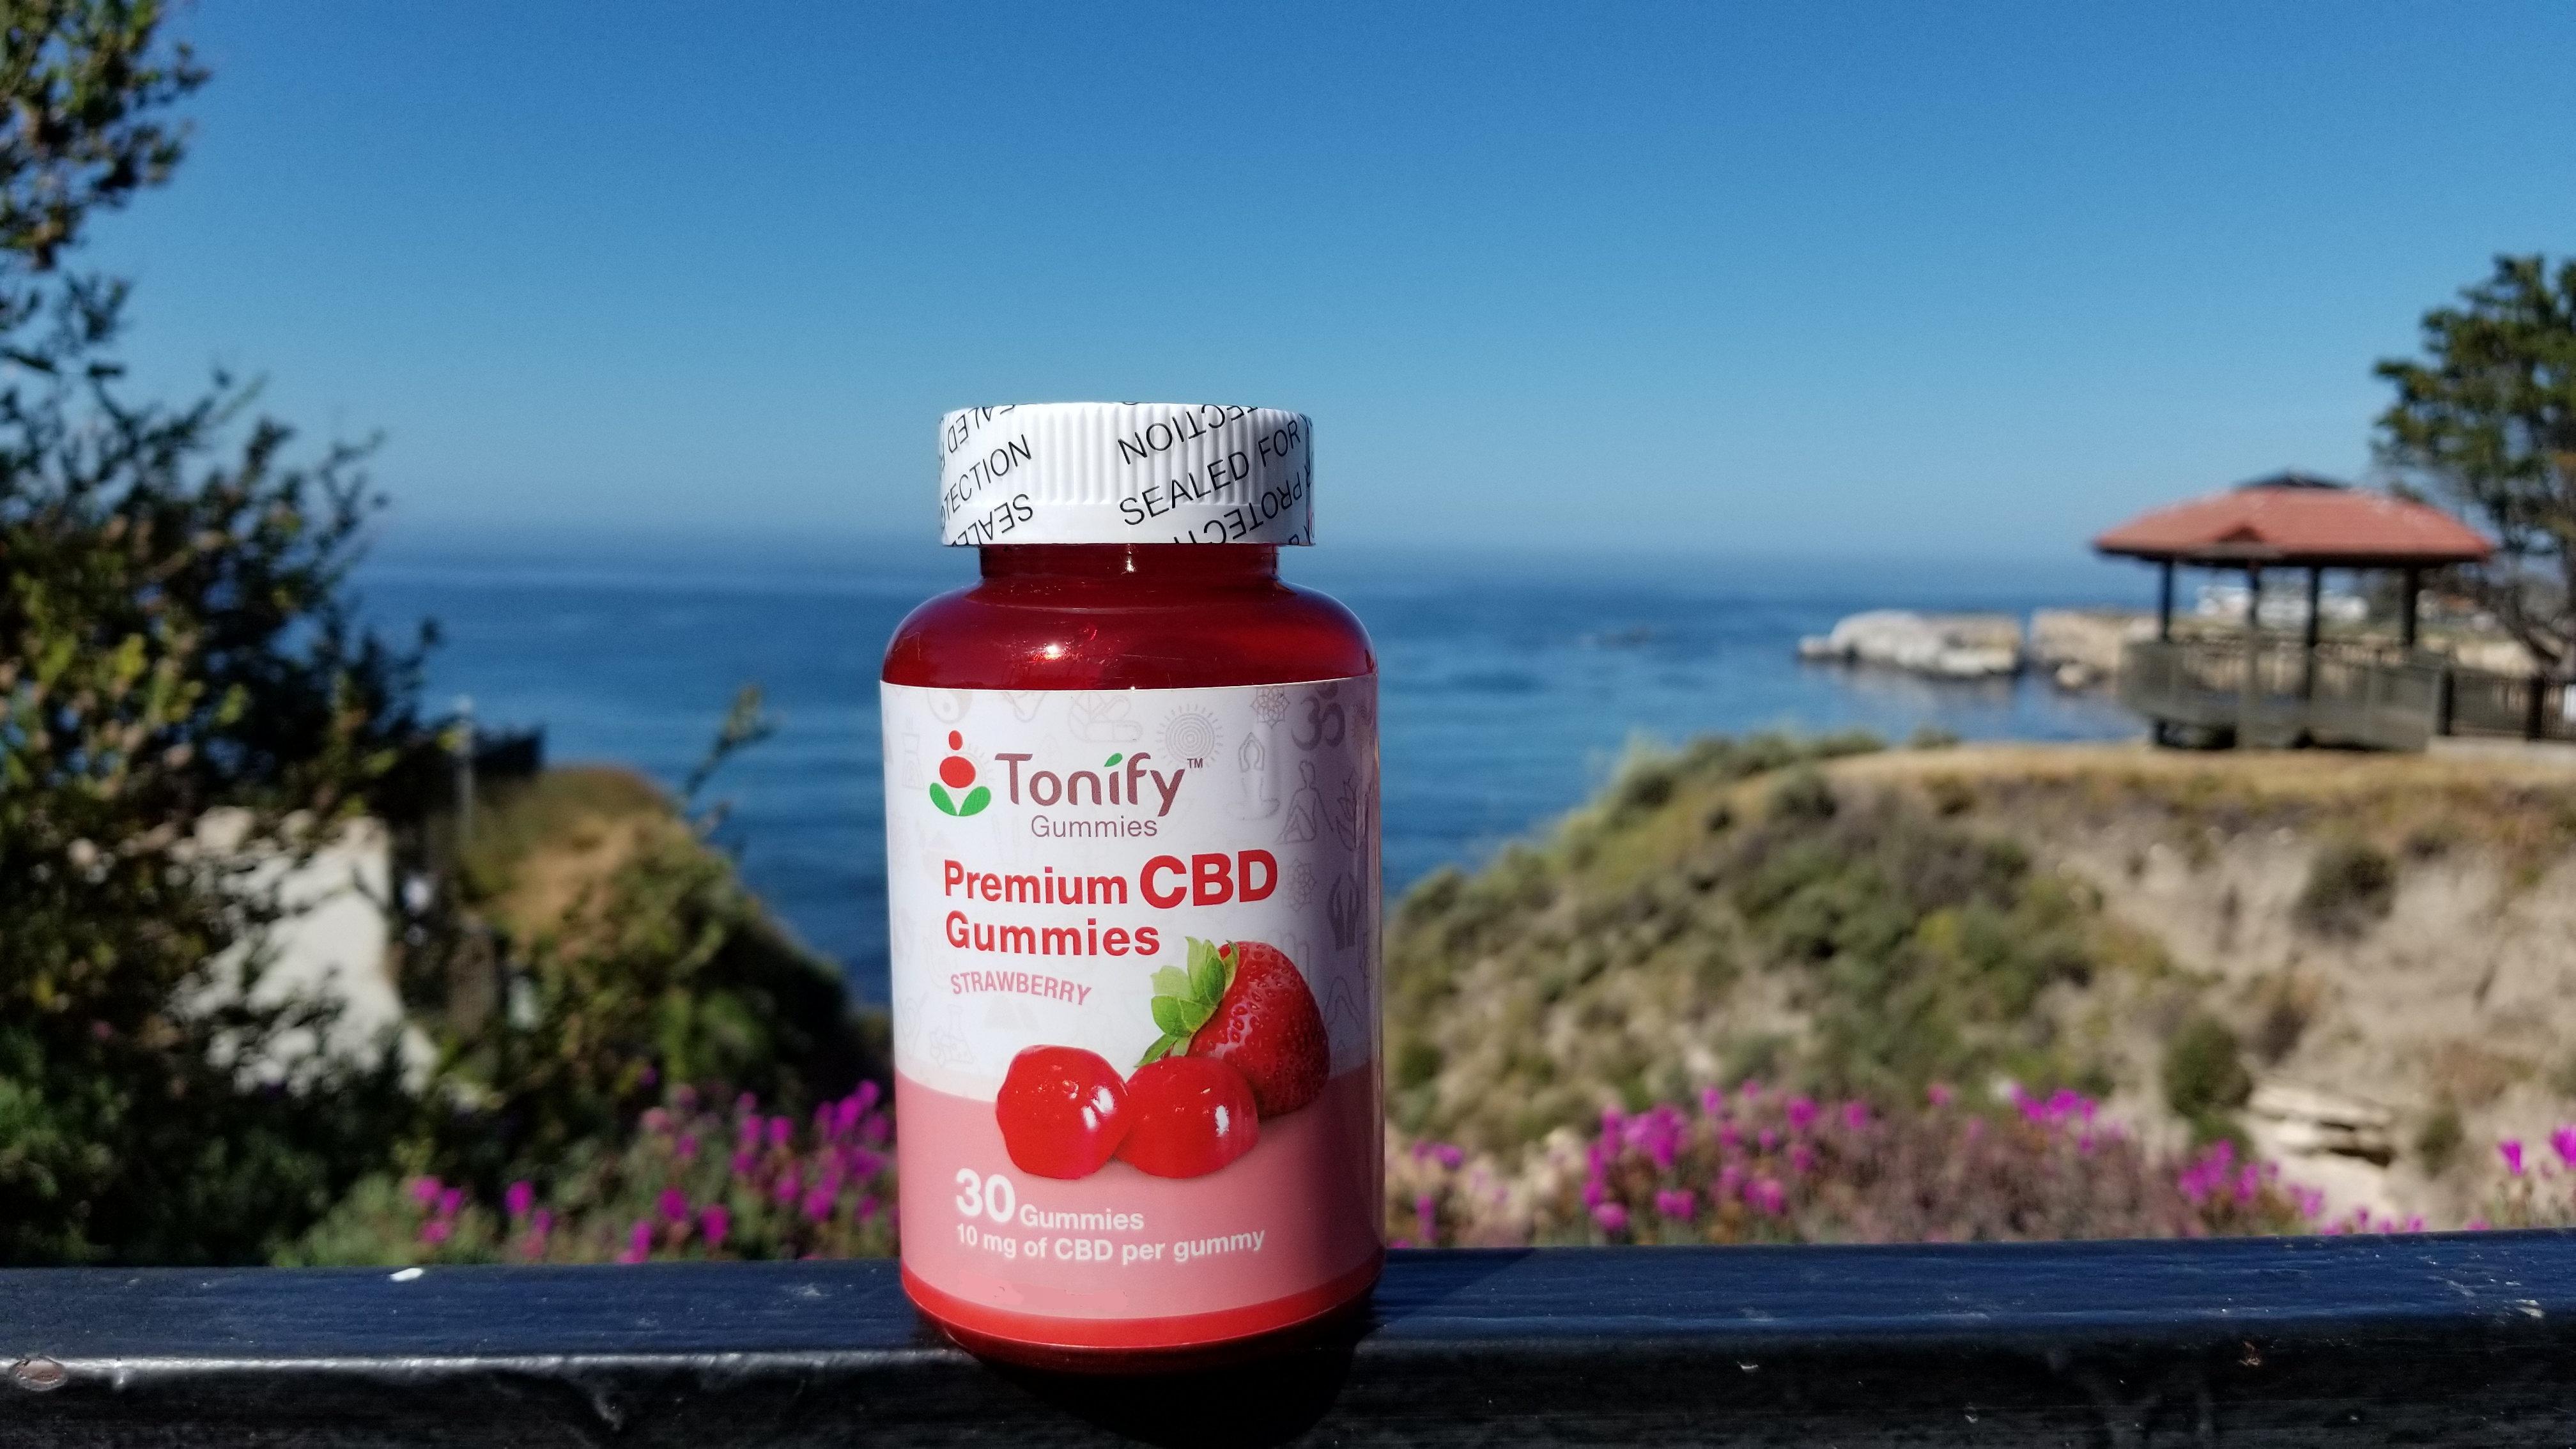 Tonify Premium CBD Vegan Gummies - 10mg of CBD per gummy - 30 Ct -  Strawberry